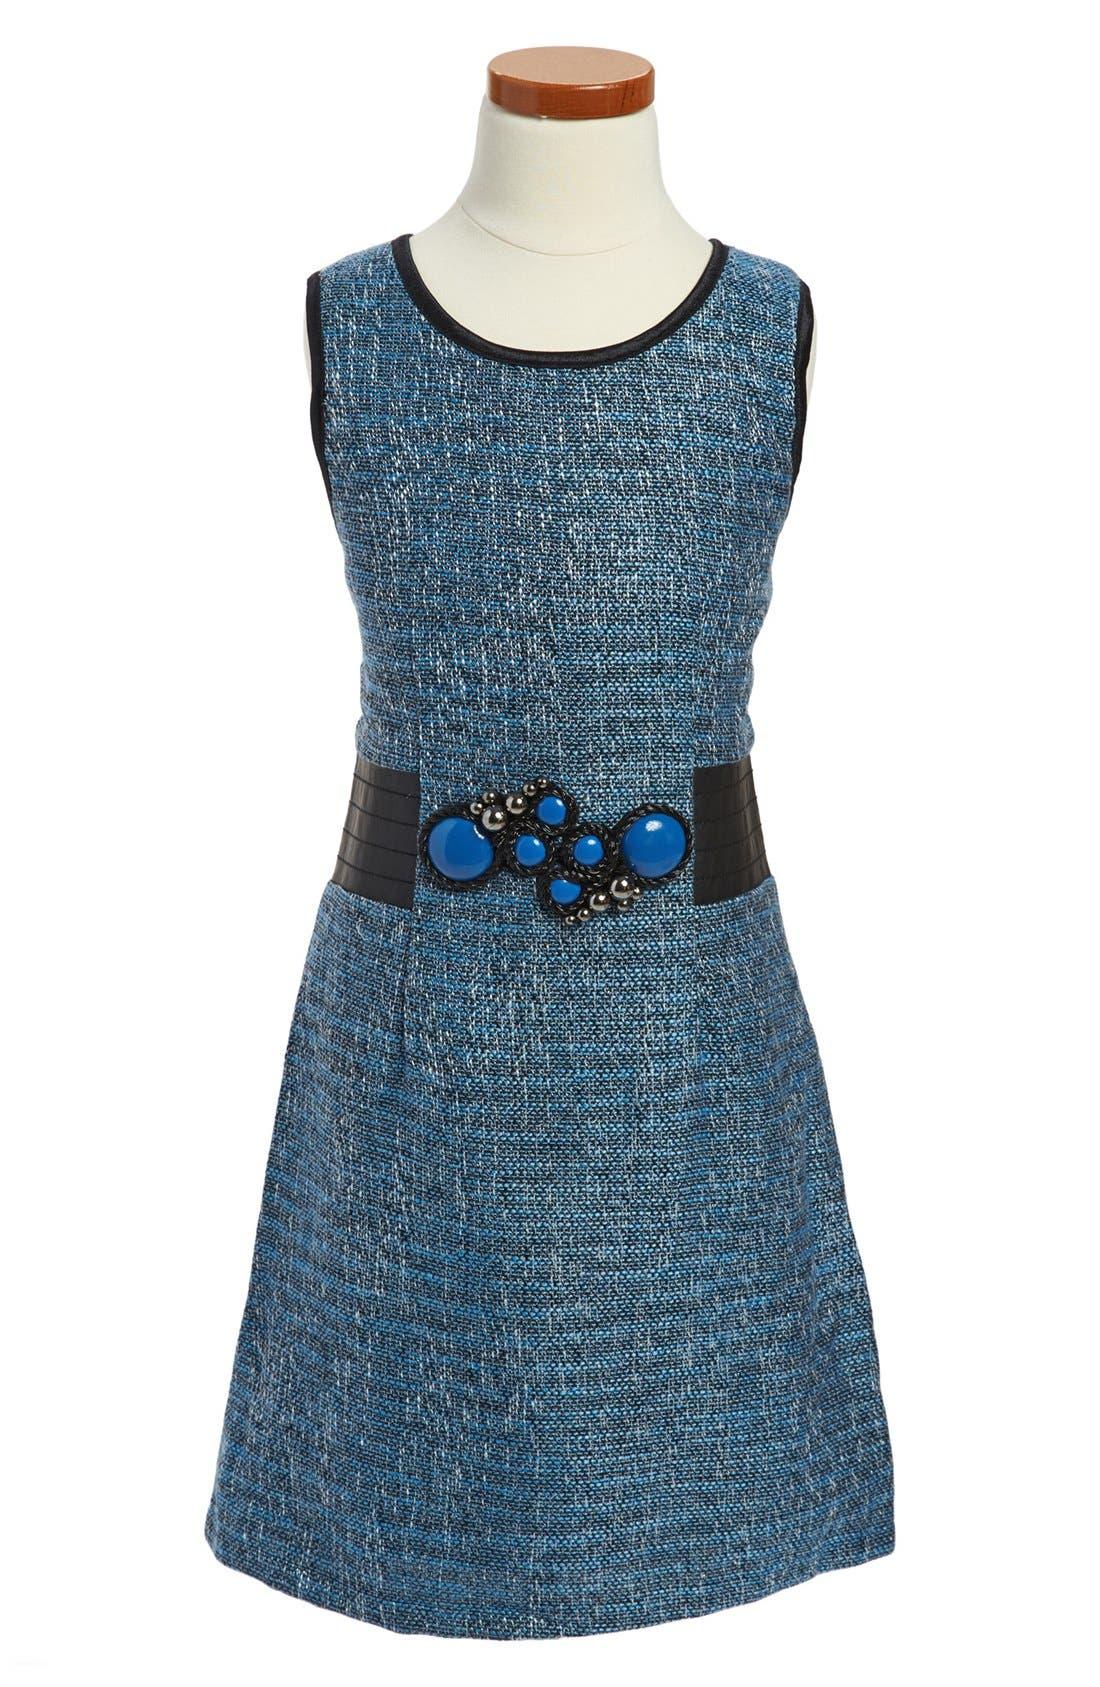 Alternate Image 1 Selected - Laundry by Shelli Segal 'Gemma' Tweed Dress (Big Girls)